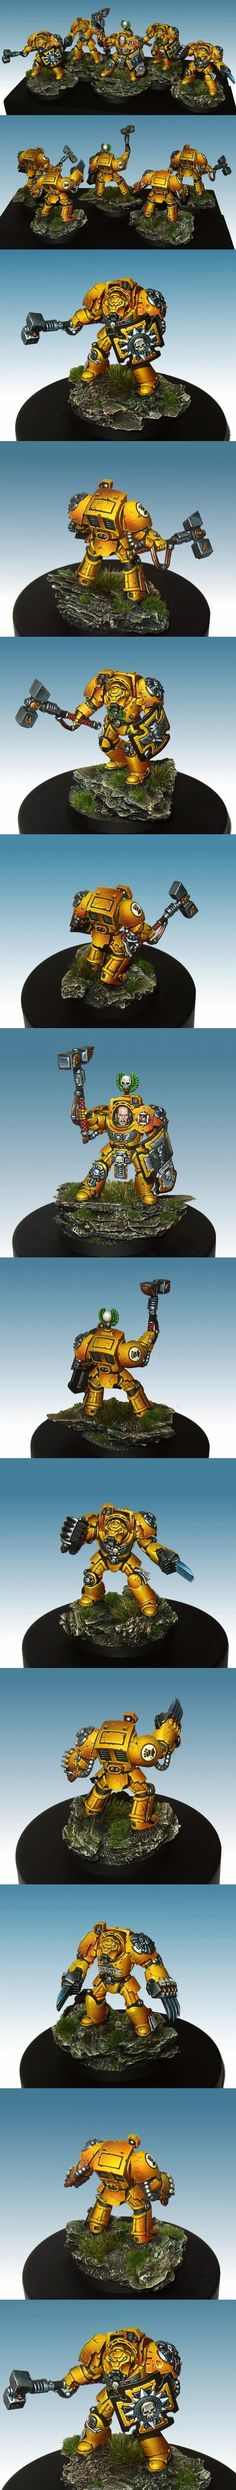 Imperial Fists Terminator Assault squad